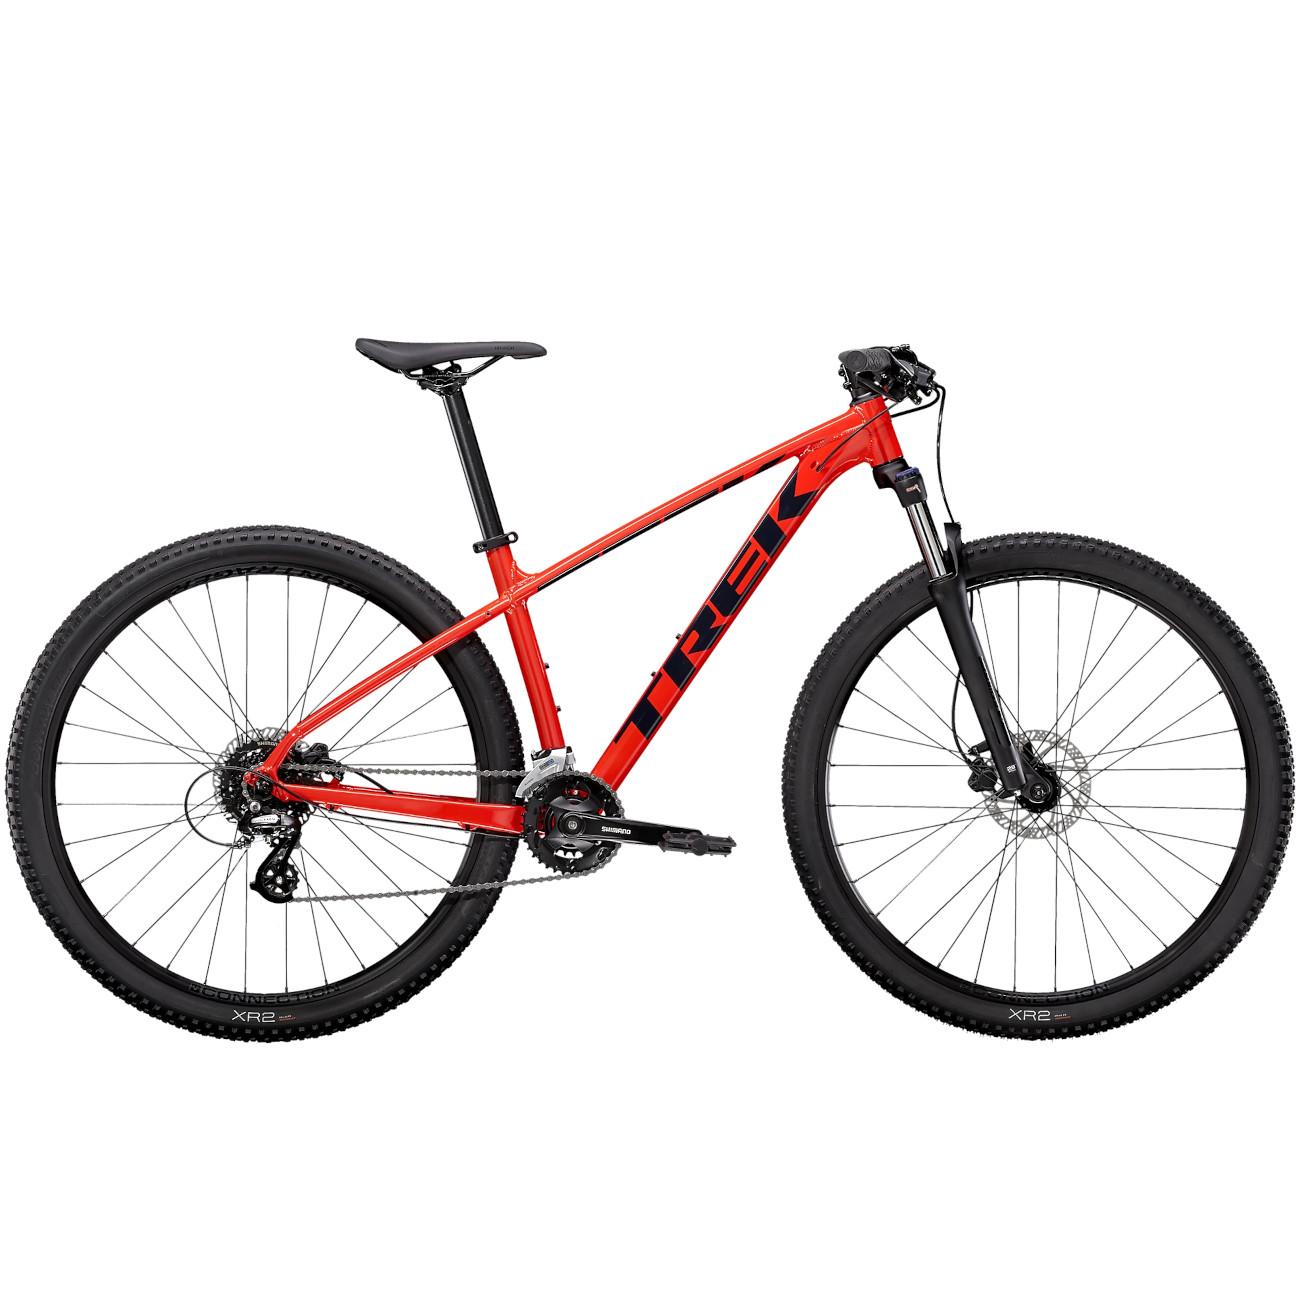 Trek MARLIN 6 Mountainbike - 2022 - Radioactive Red / Trek Black